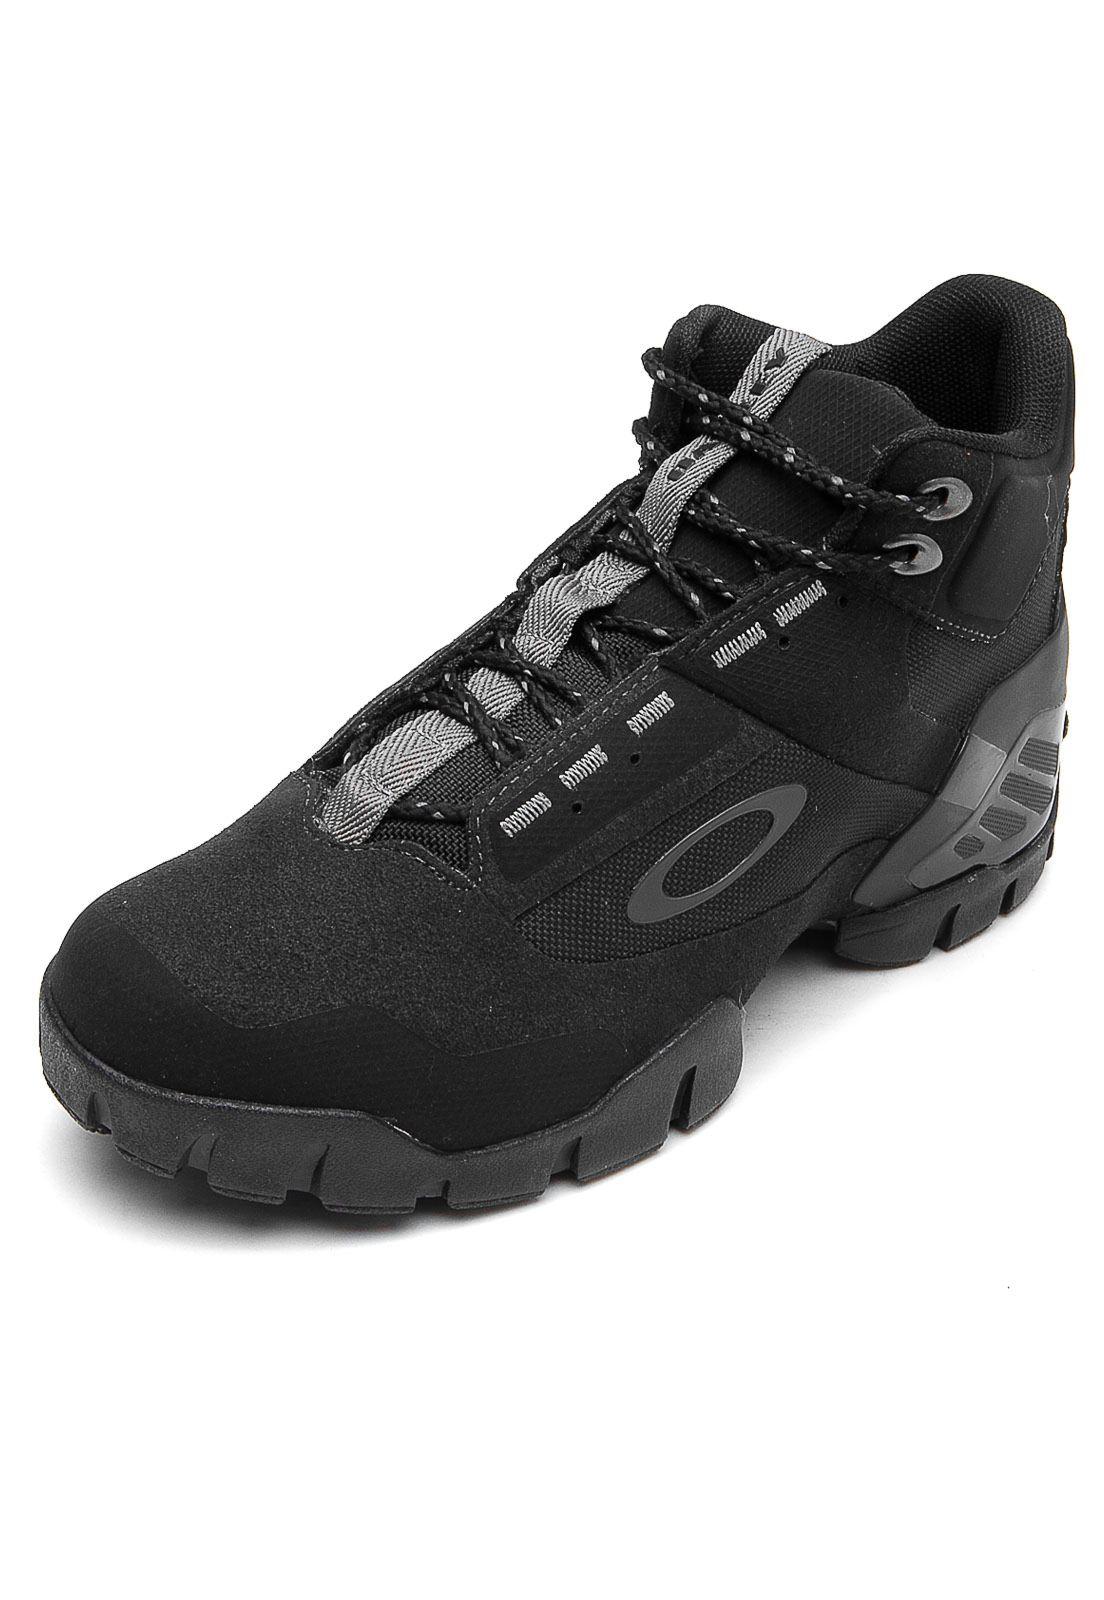 t�nis mizuno masculino wave creation 19 uruguay jones shoes